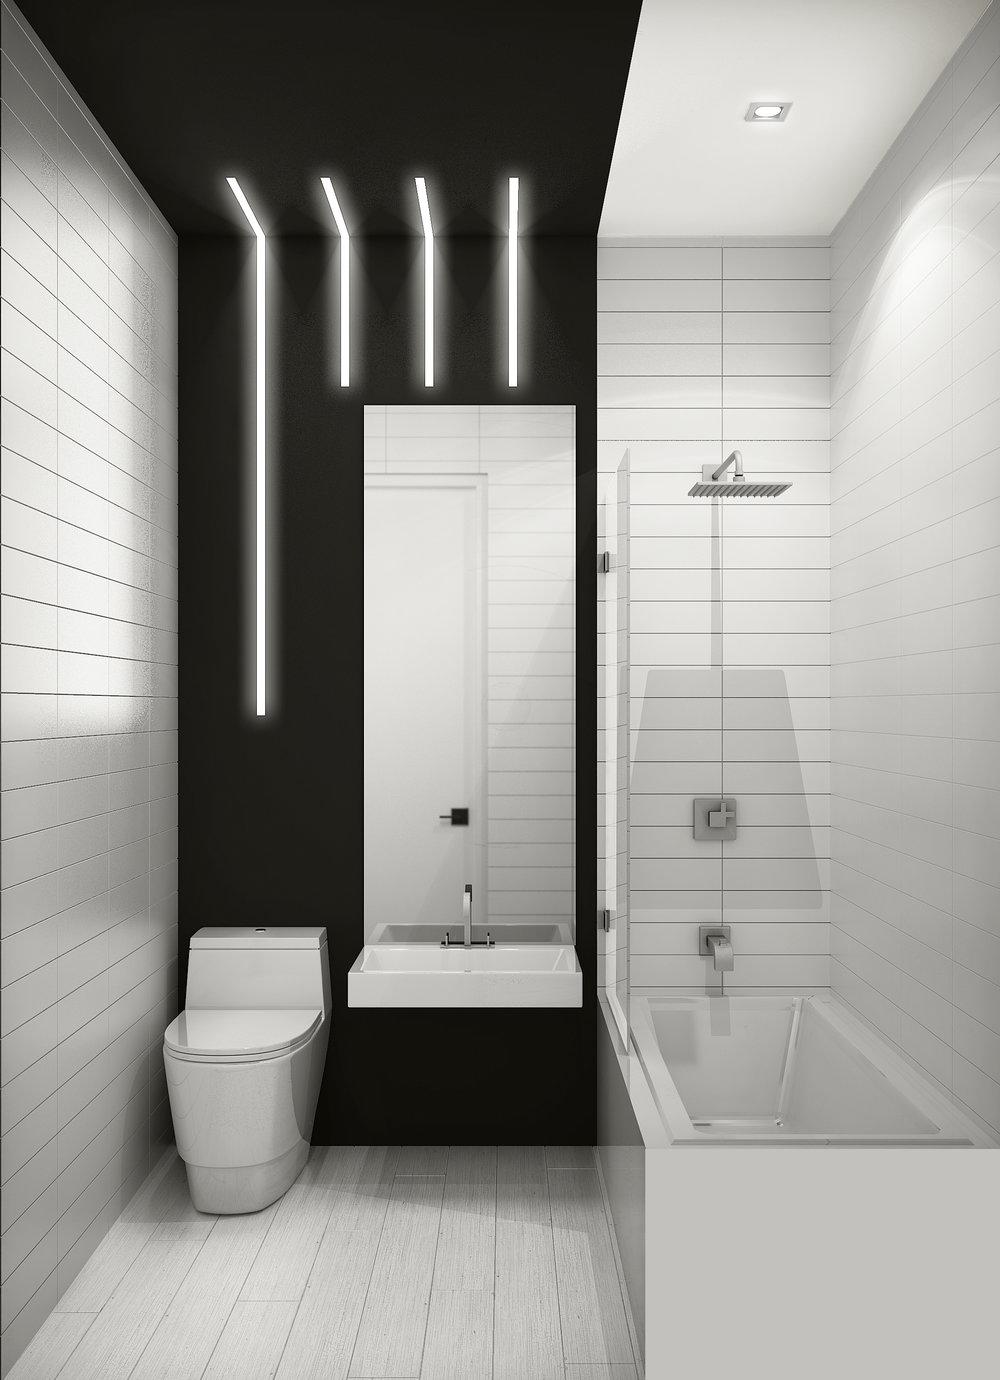 241Devoe_bathroom_scene1 (1).jpg